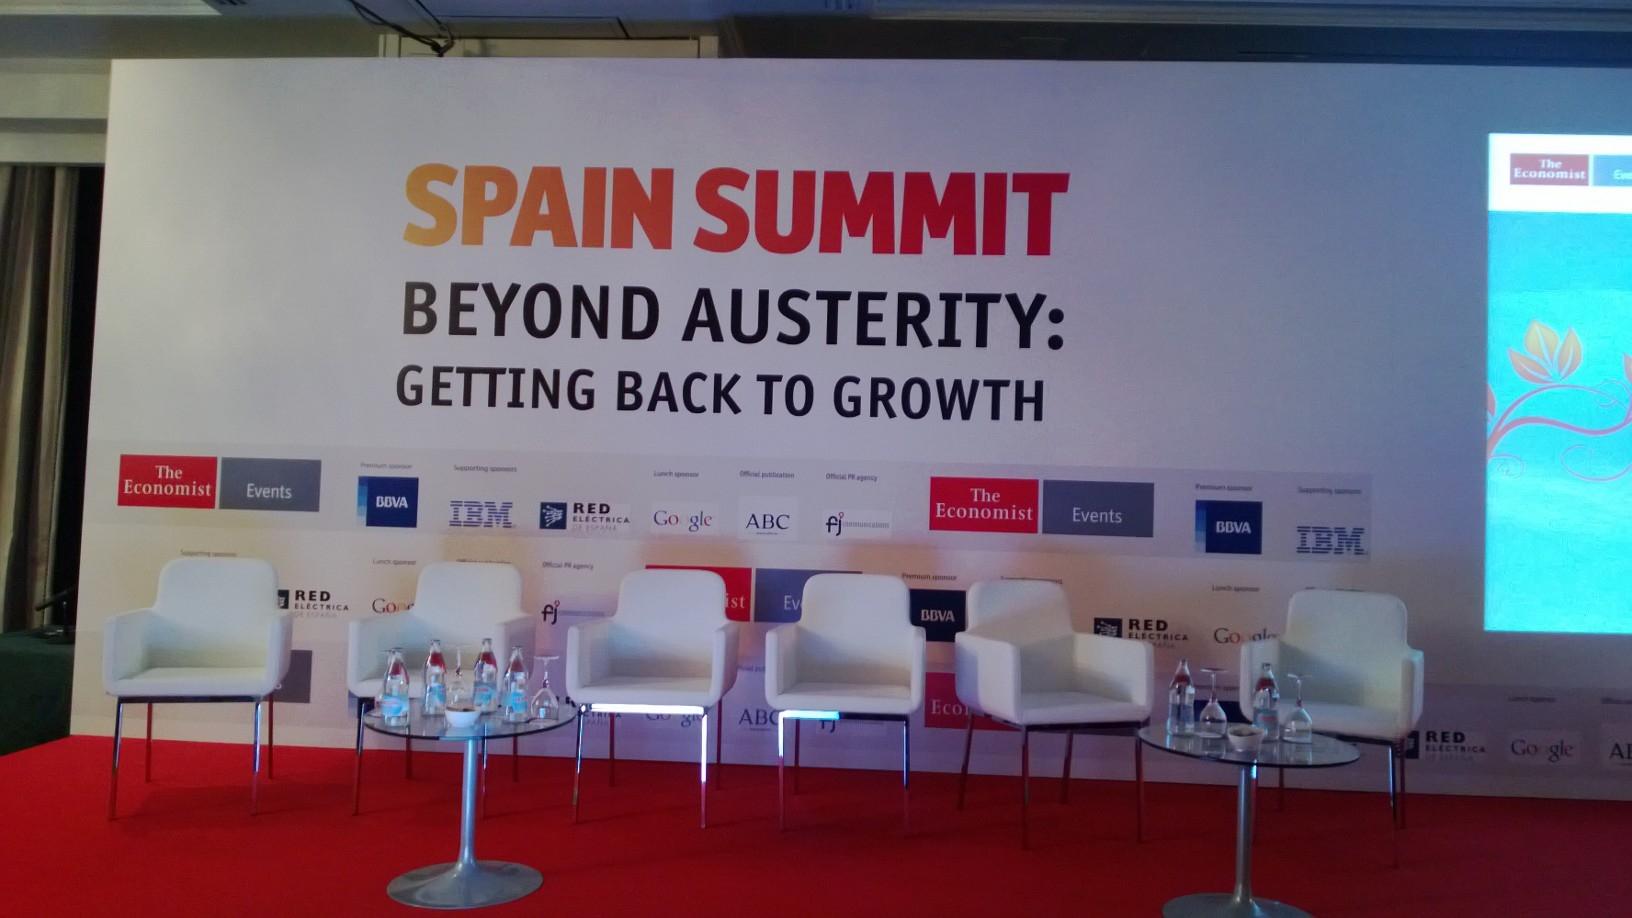 Spain Summit